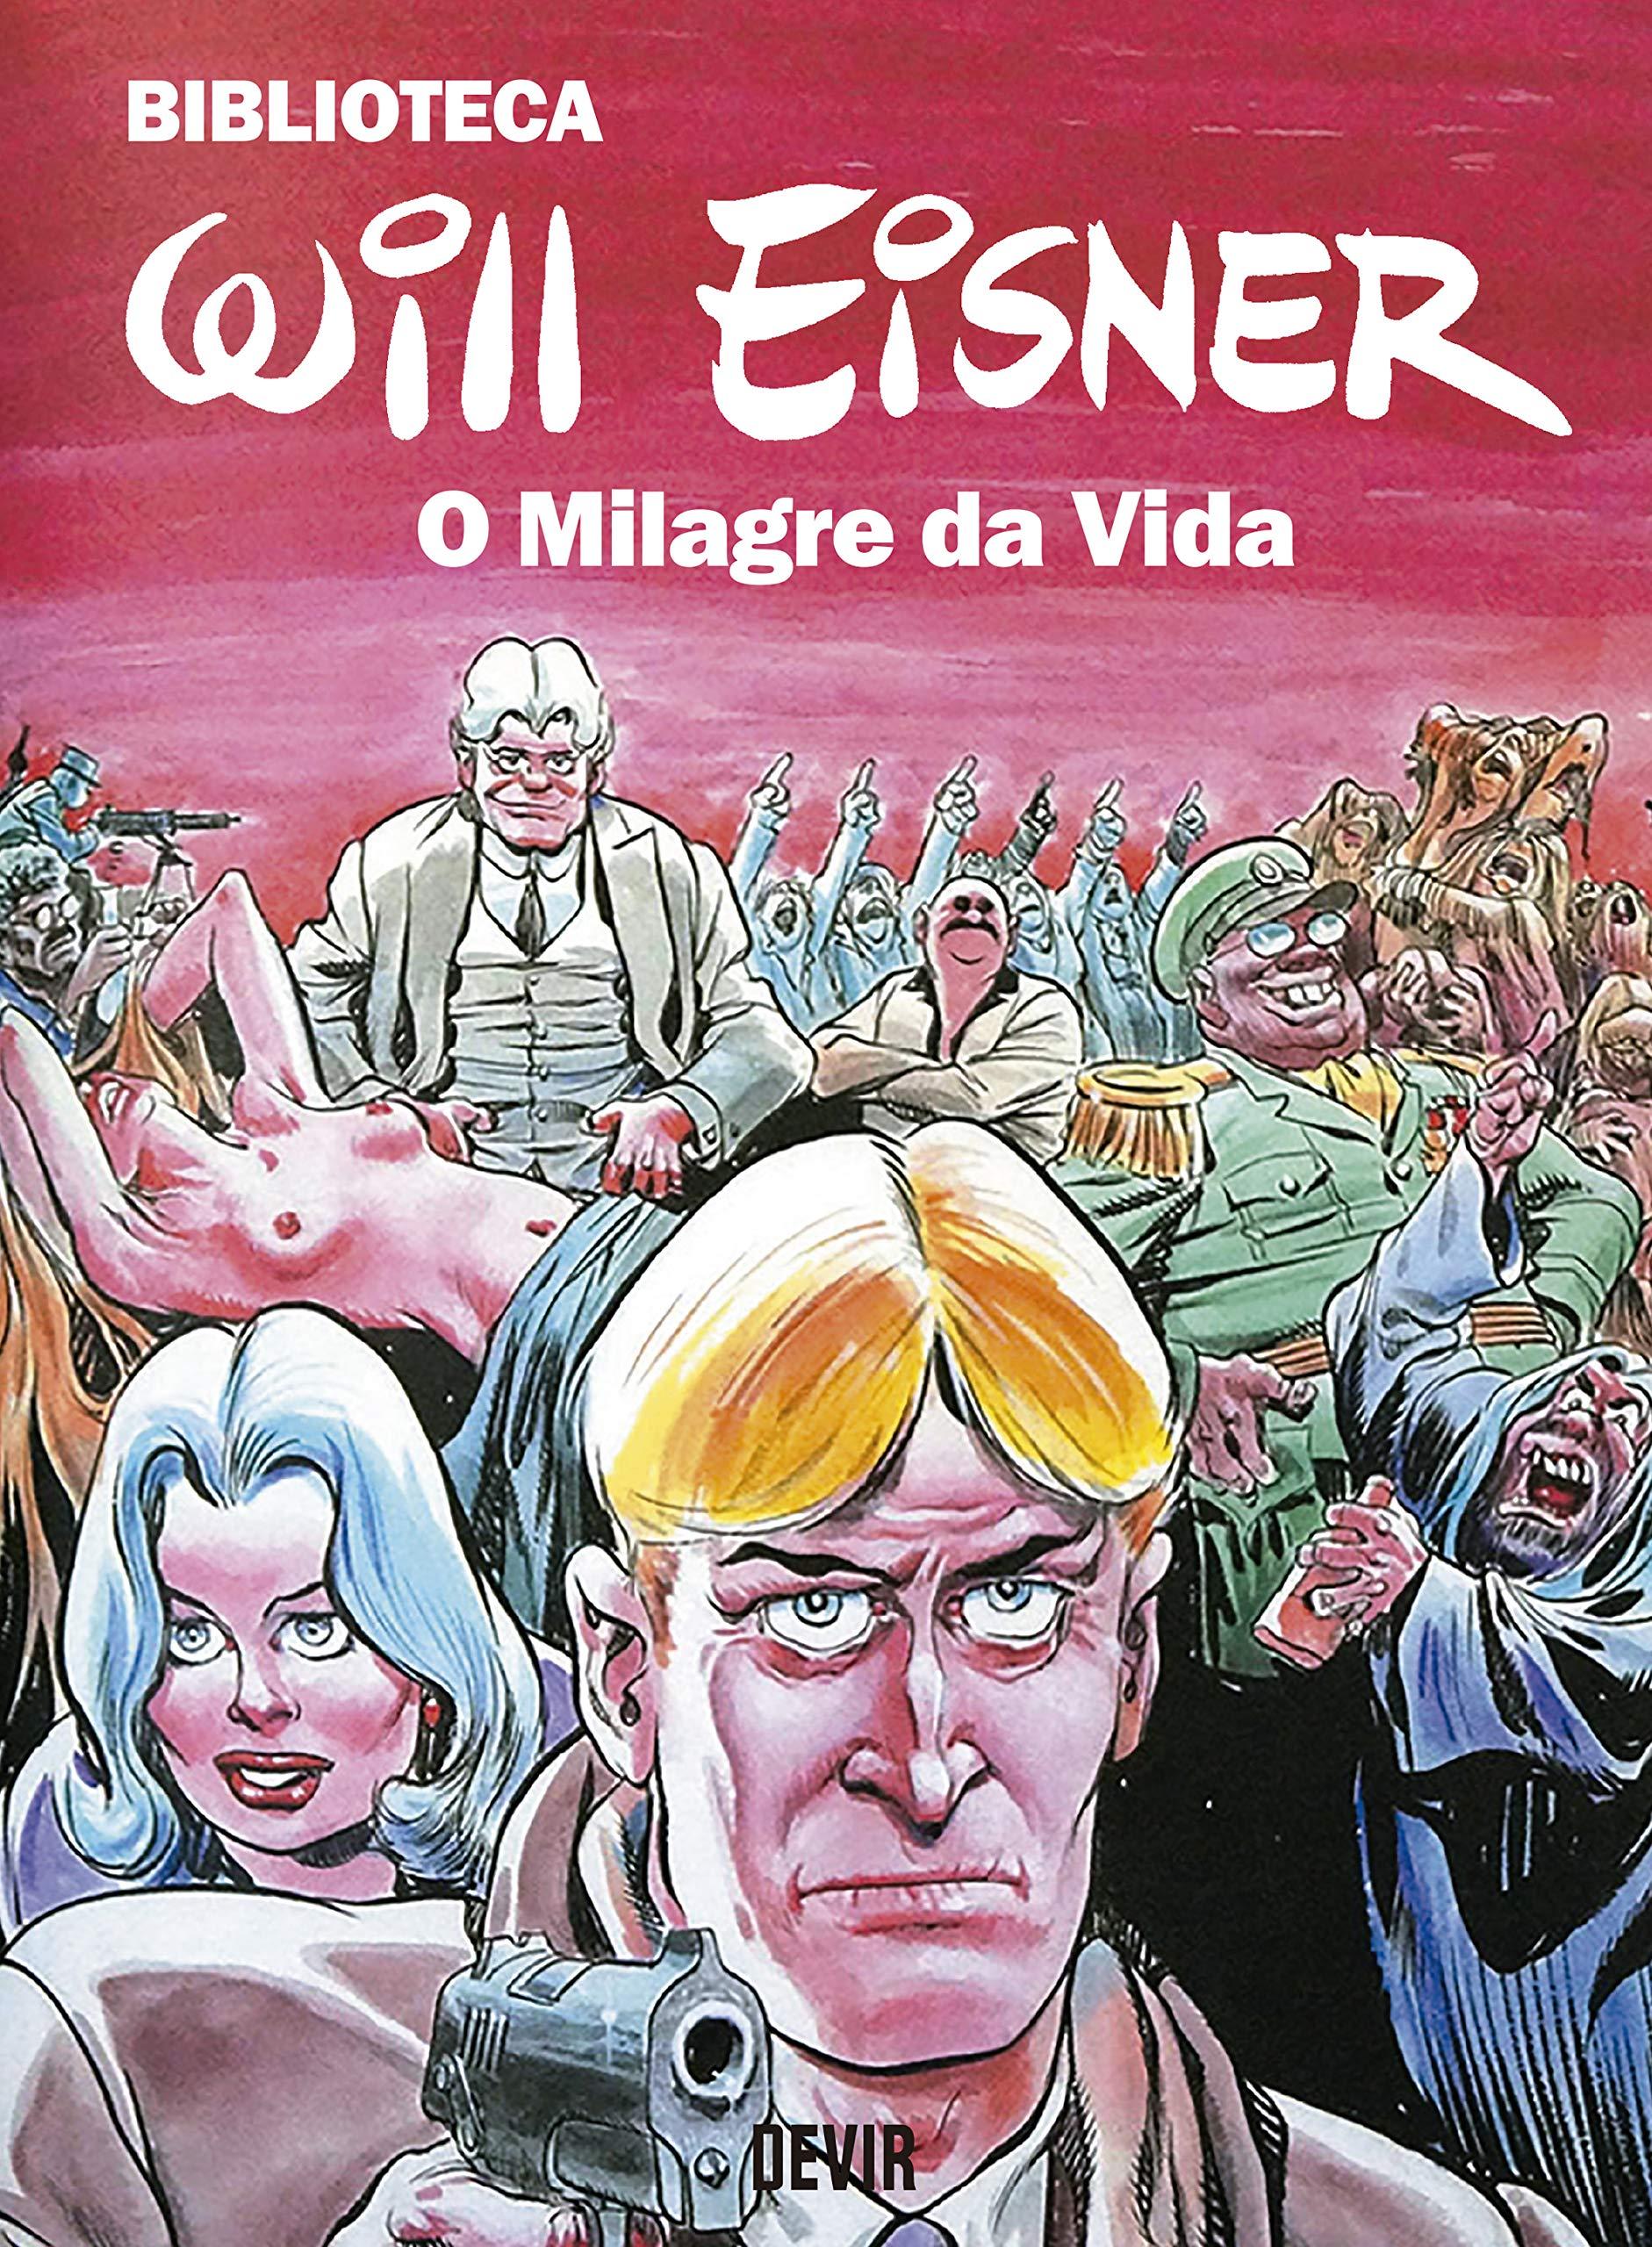 Biblioteca Eisner (exclusivo Amazon): O Milagre Da Vida (Português) Capa dura – 30 Maio 2020